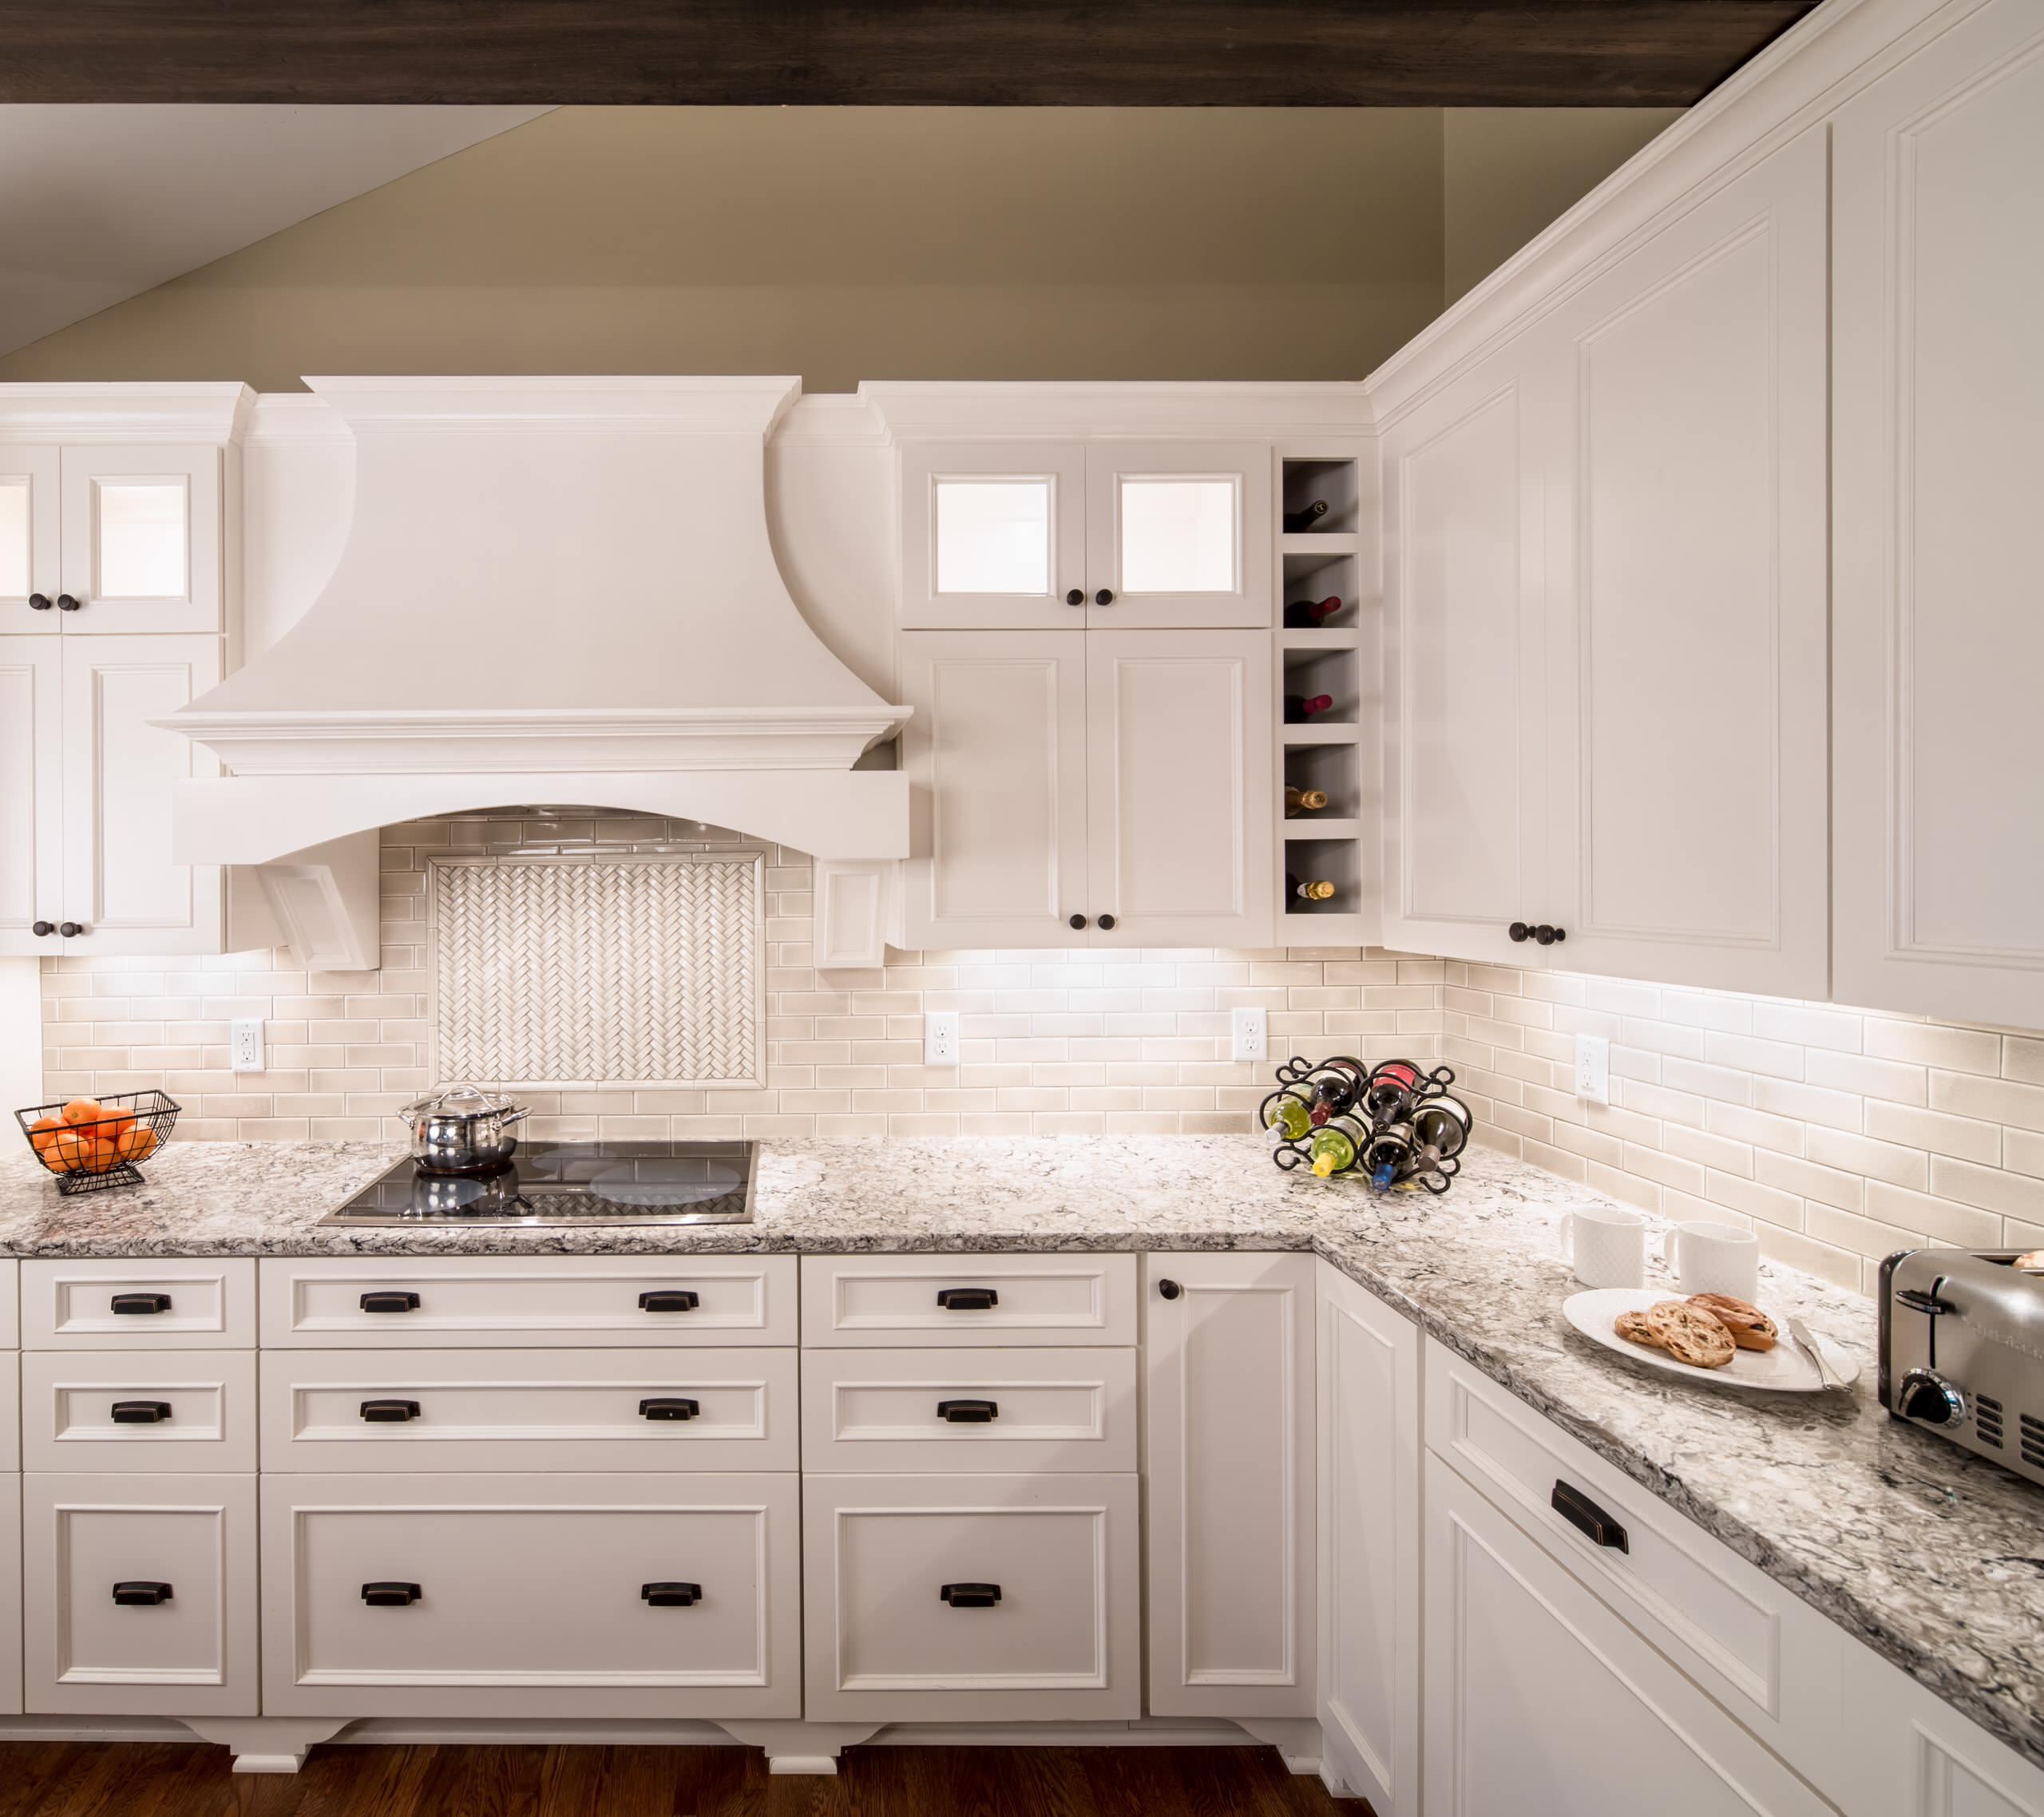 75 Beautiful Kitchen With Travertine Backsplash Pictures Ideas November 2020 Houzz